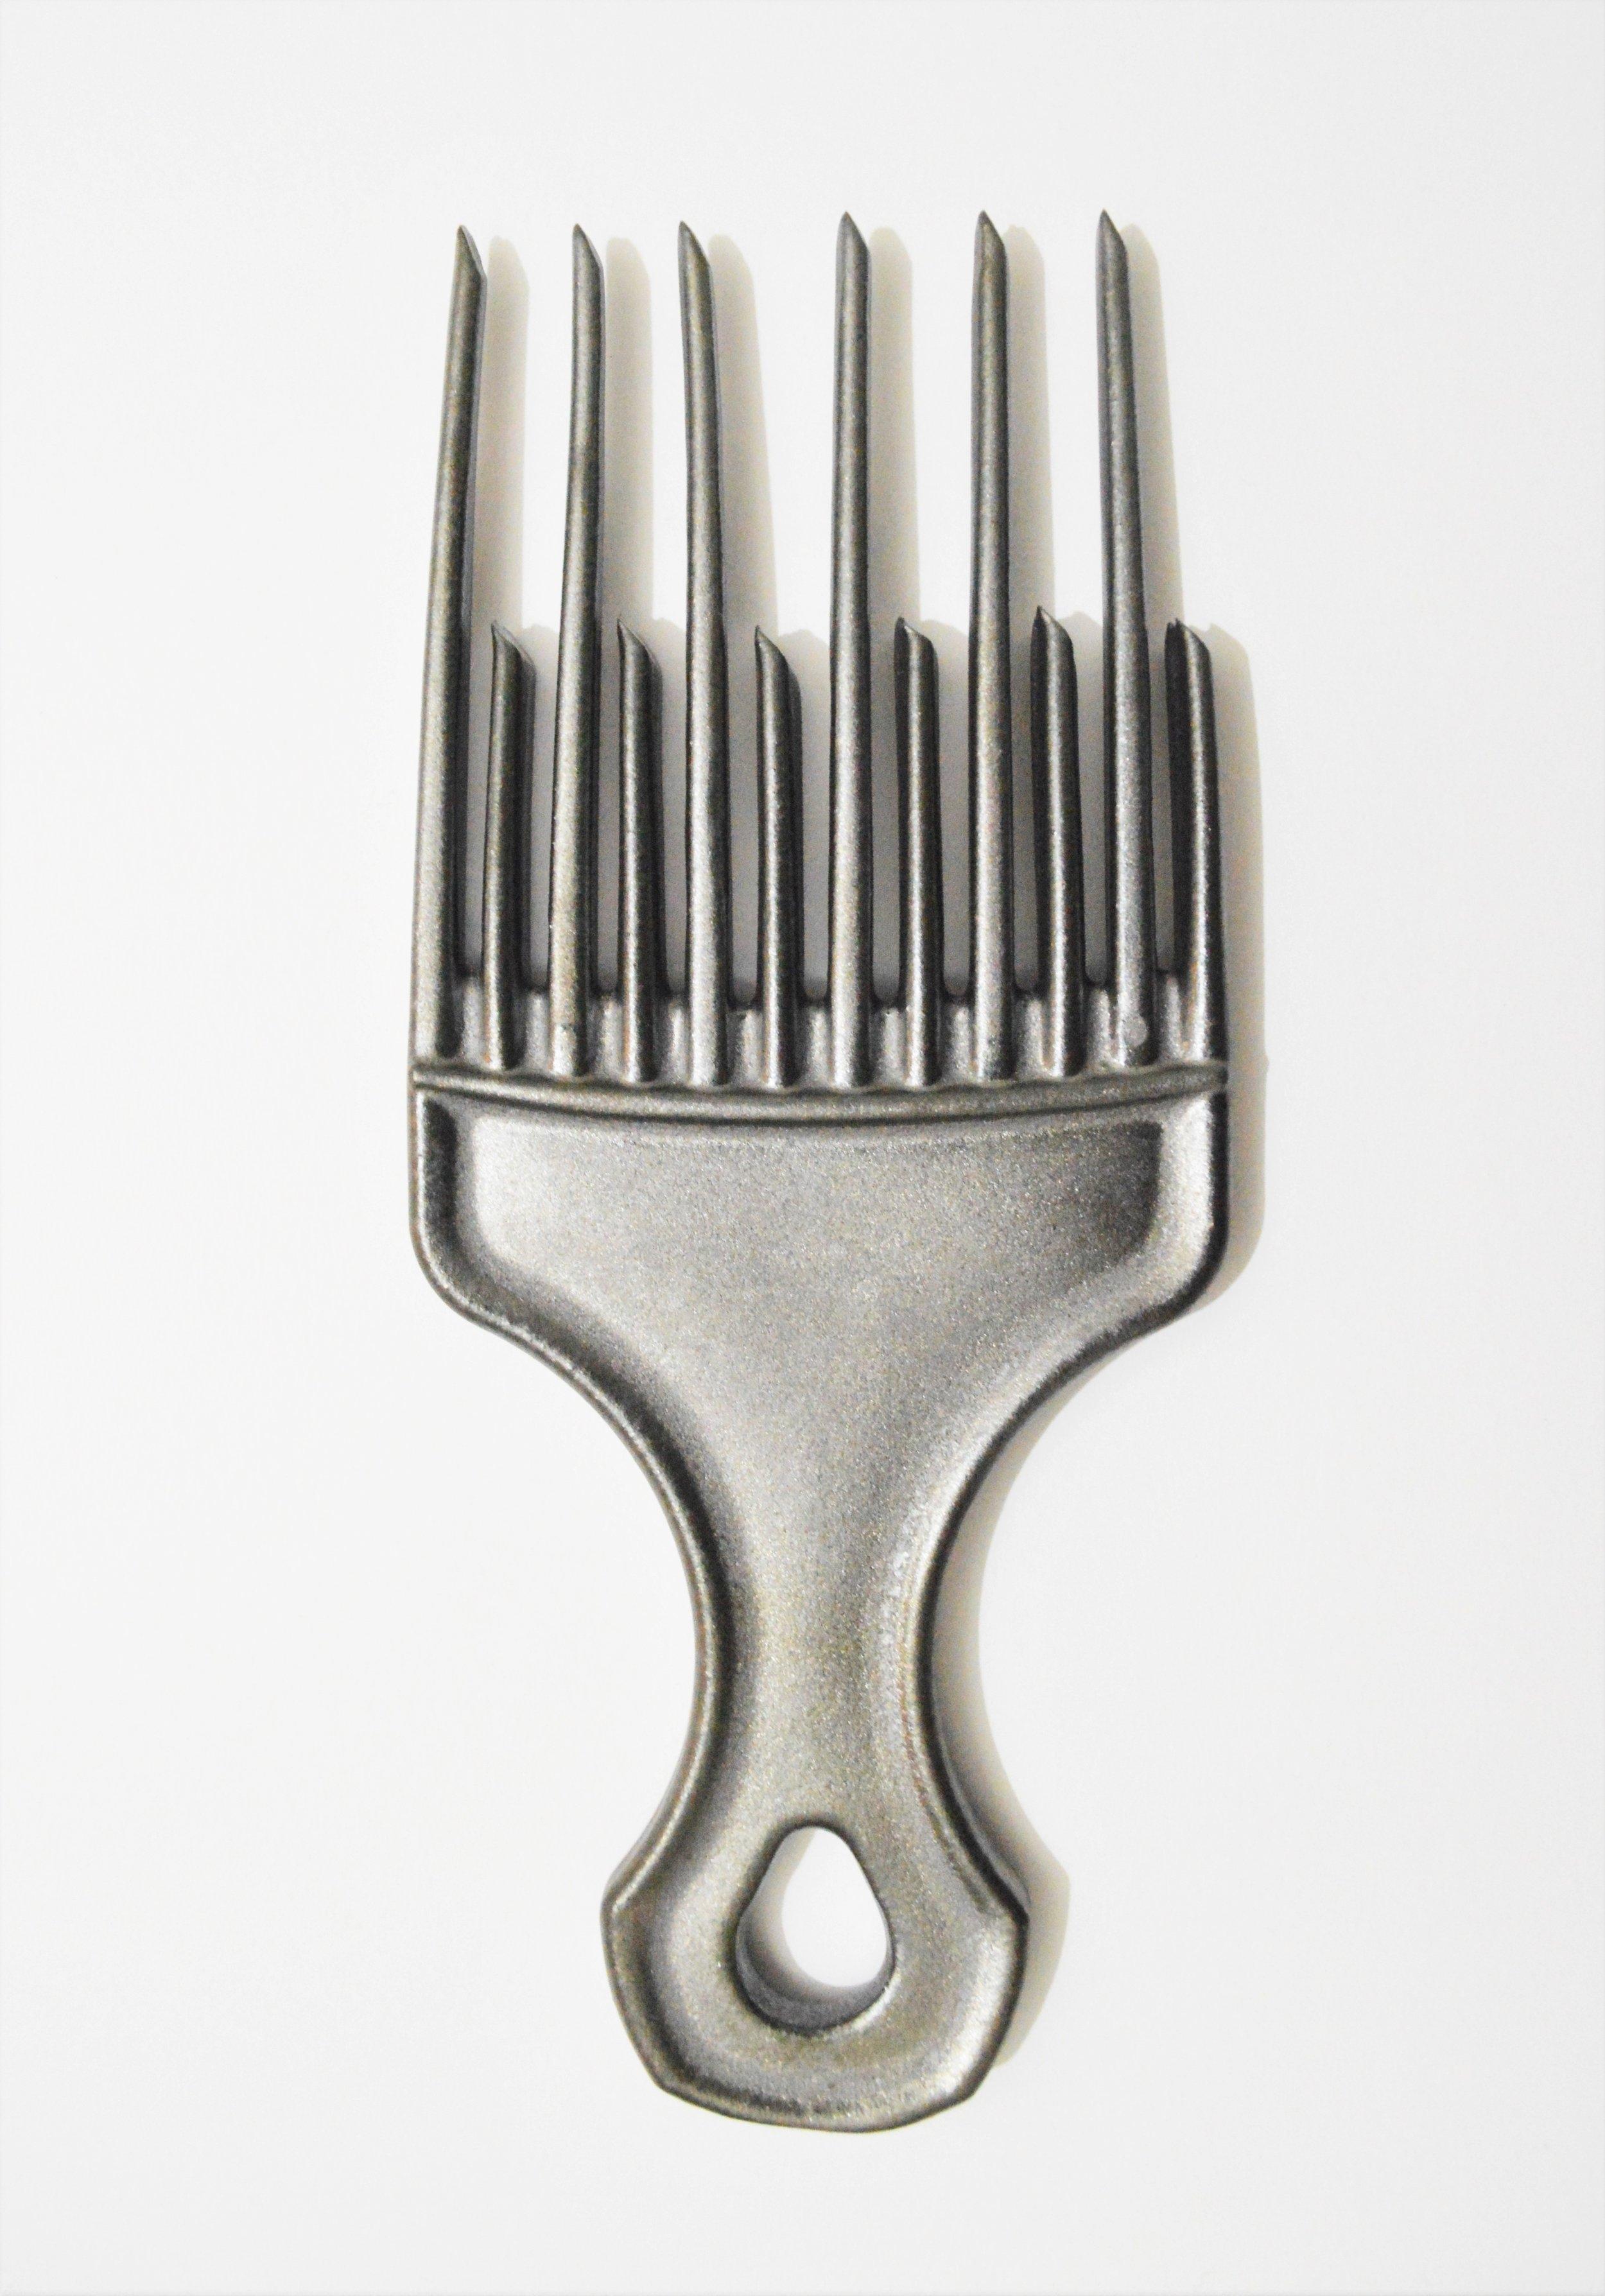 Comb 1 Test-1.jpg